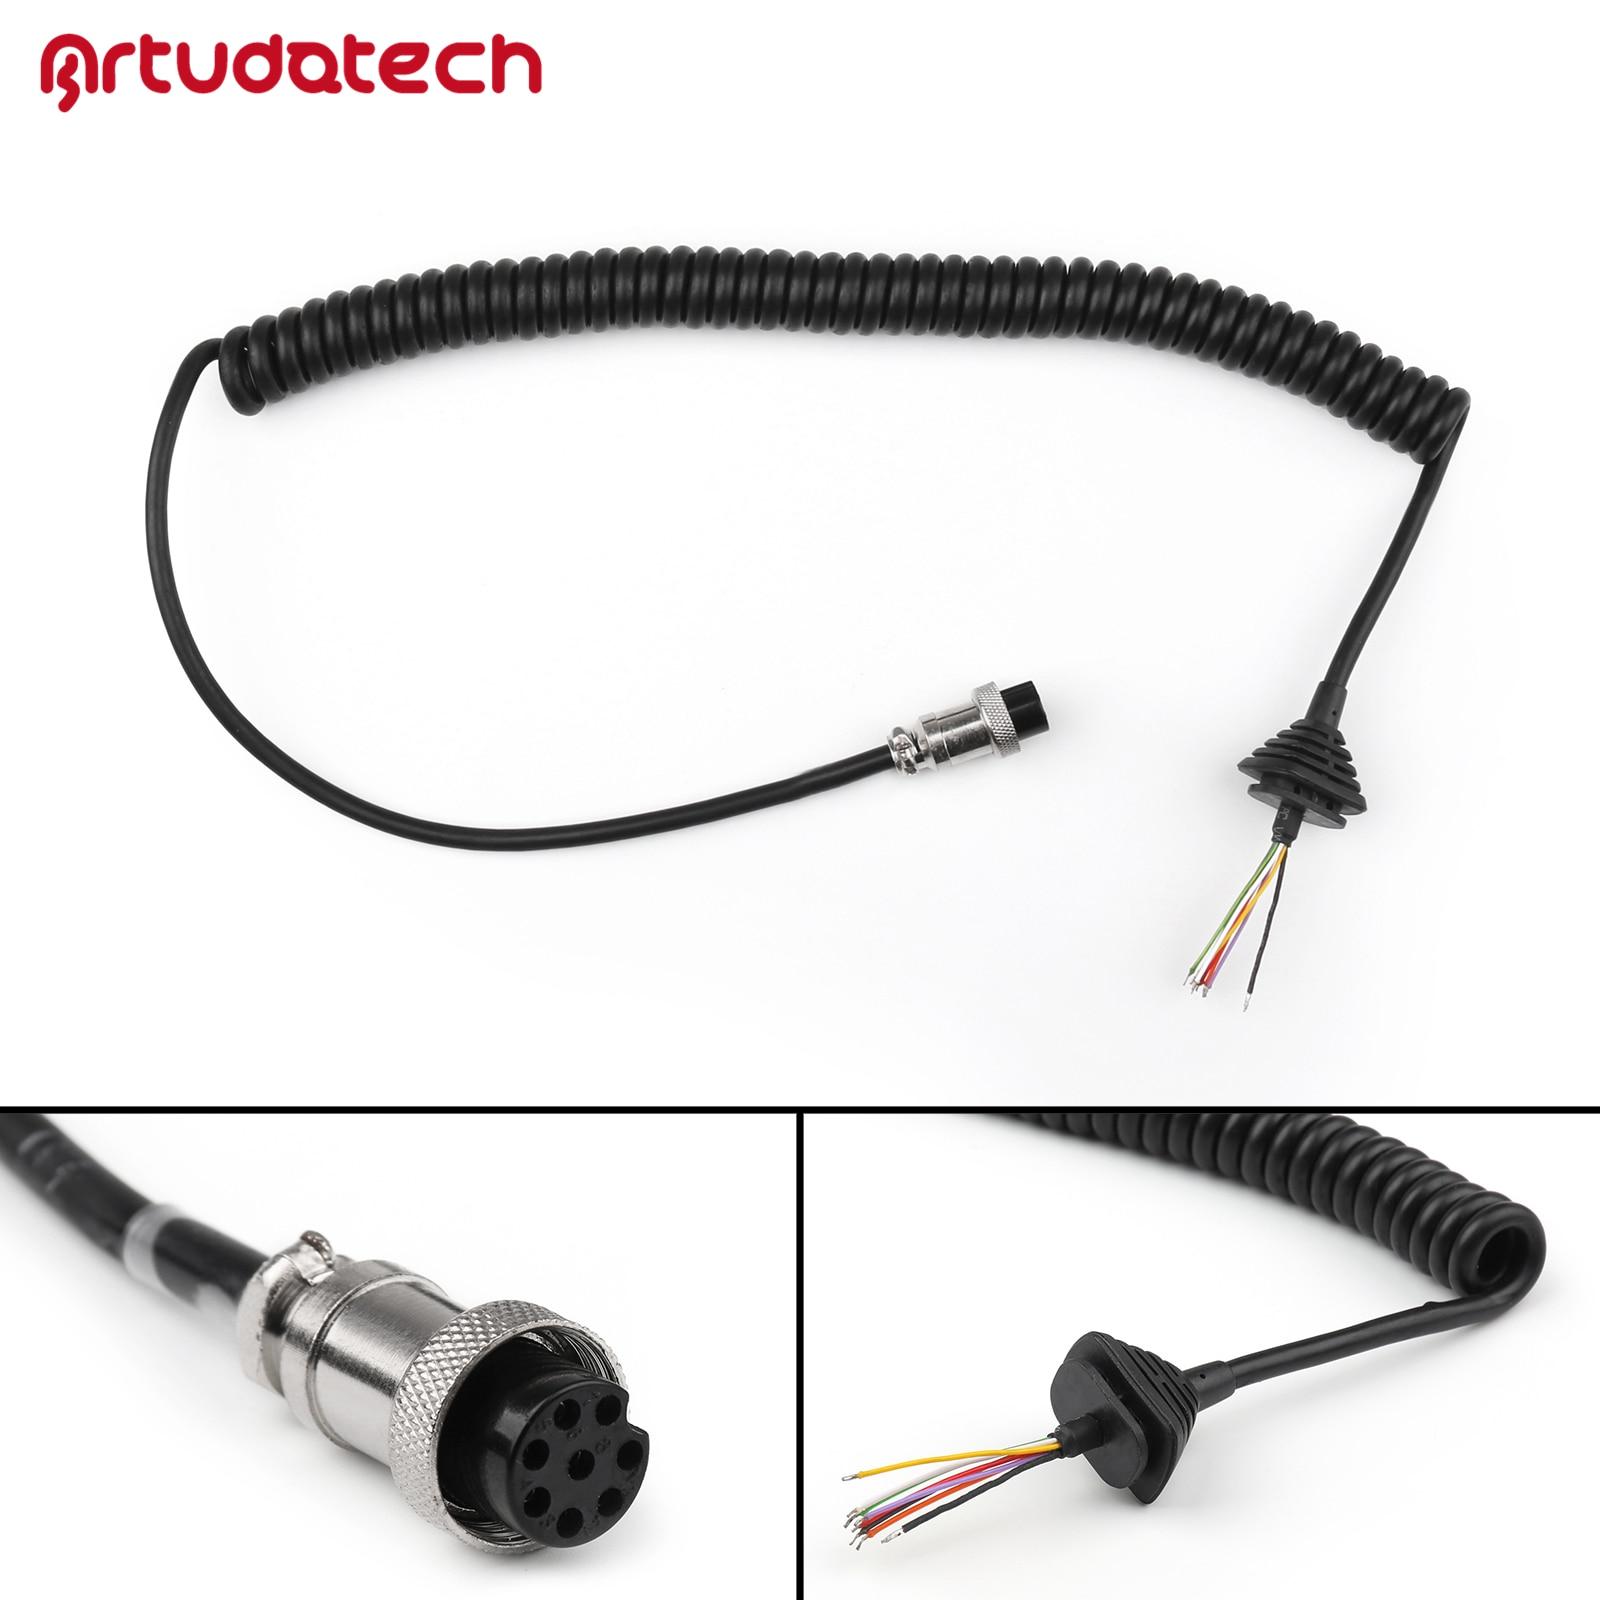 Artudatech EMS-53 EMS-57 Mic Cable Line For ALICON DR430 DR135 DR620 DR635 DR435 Handheld Microphone